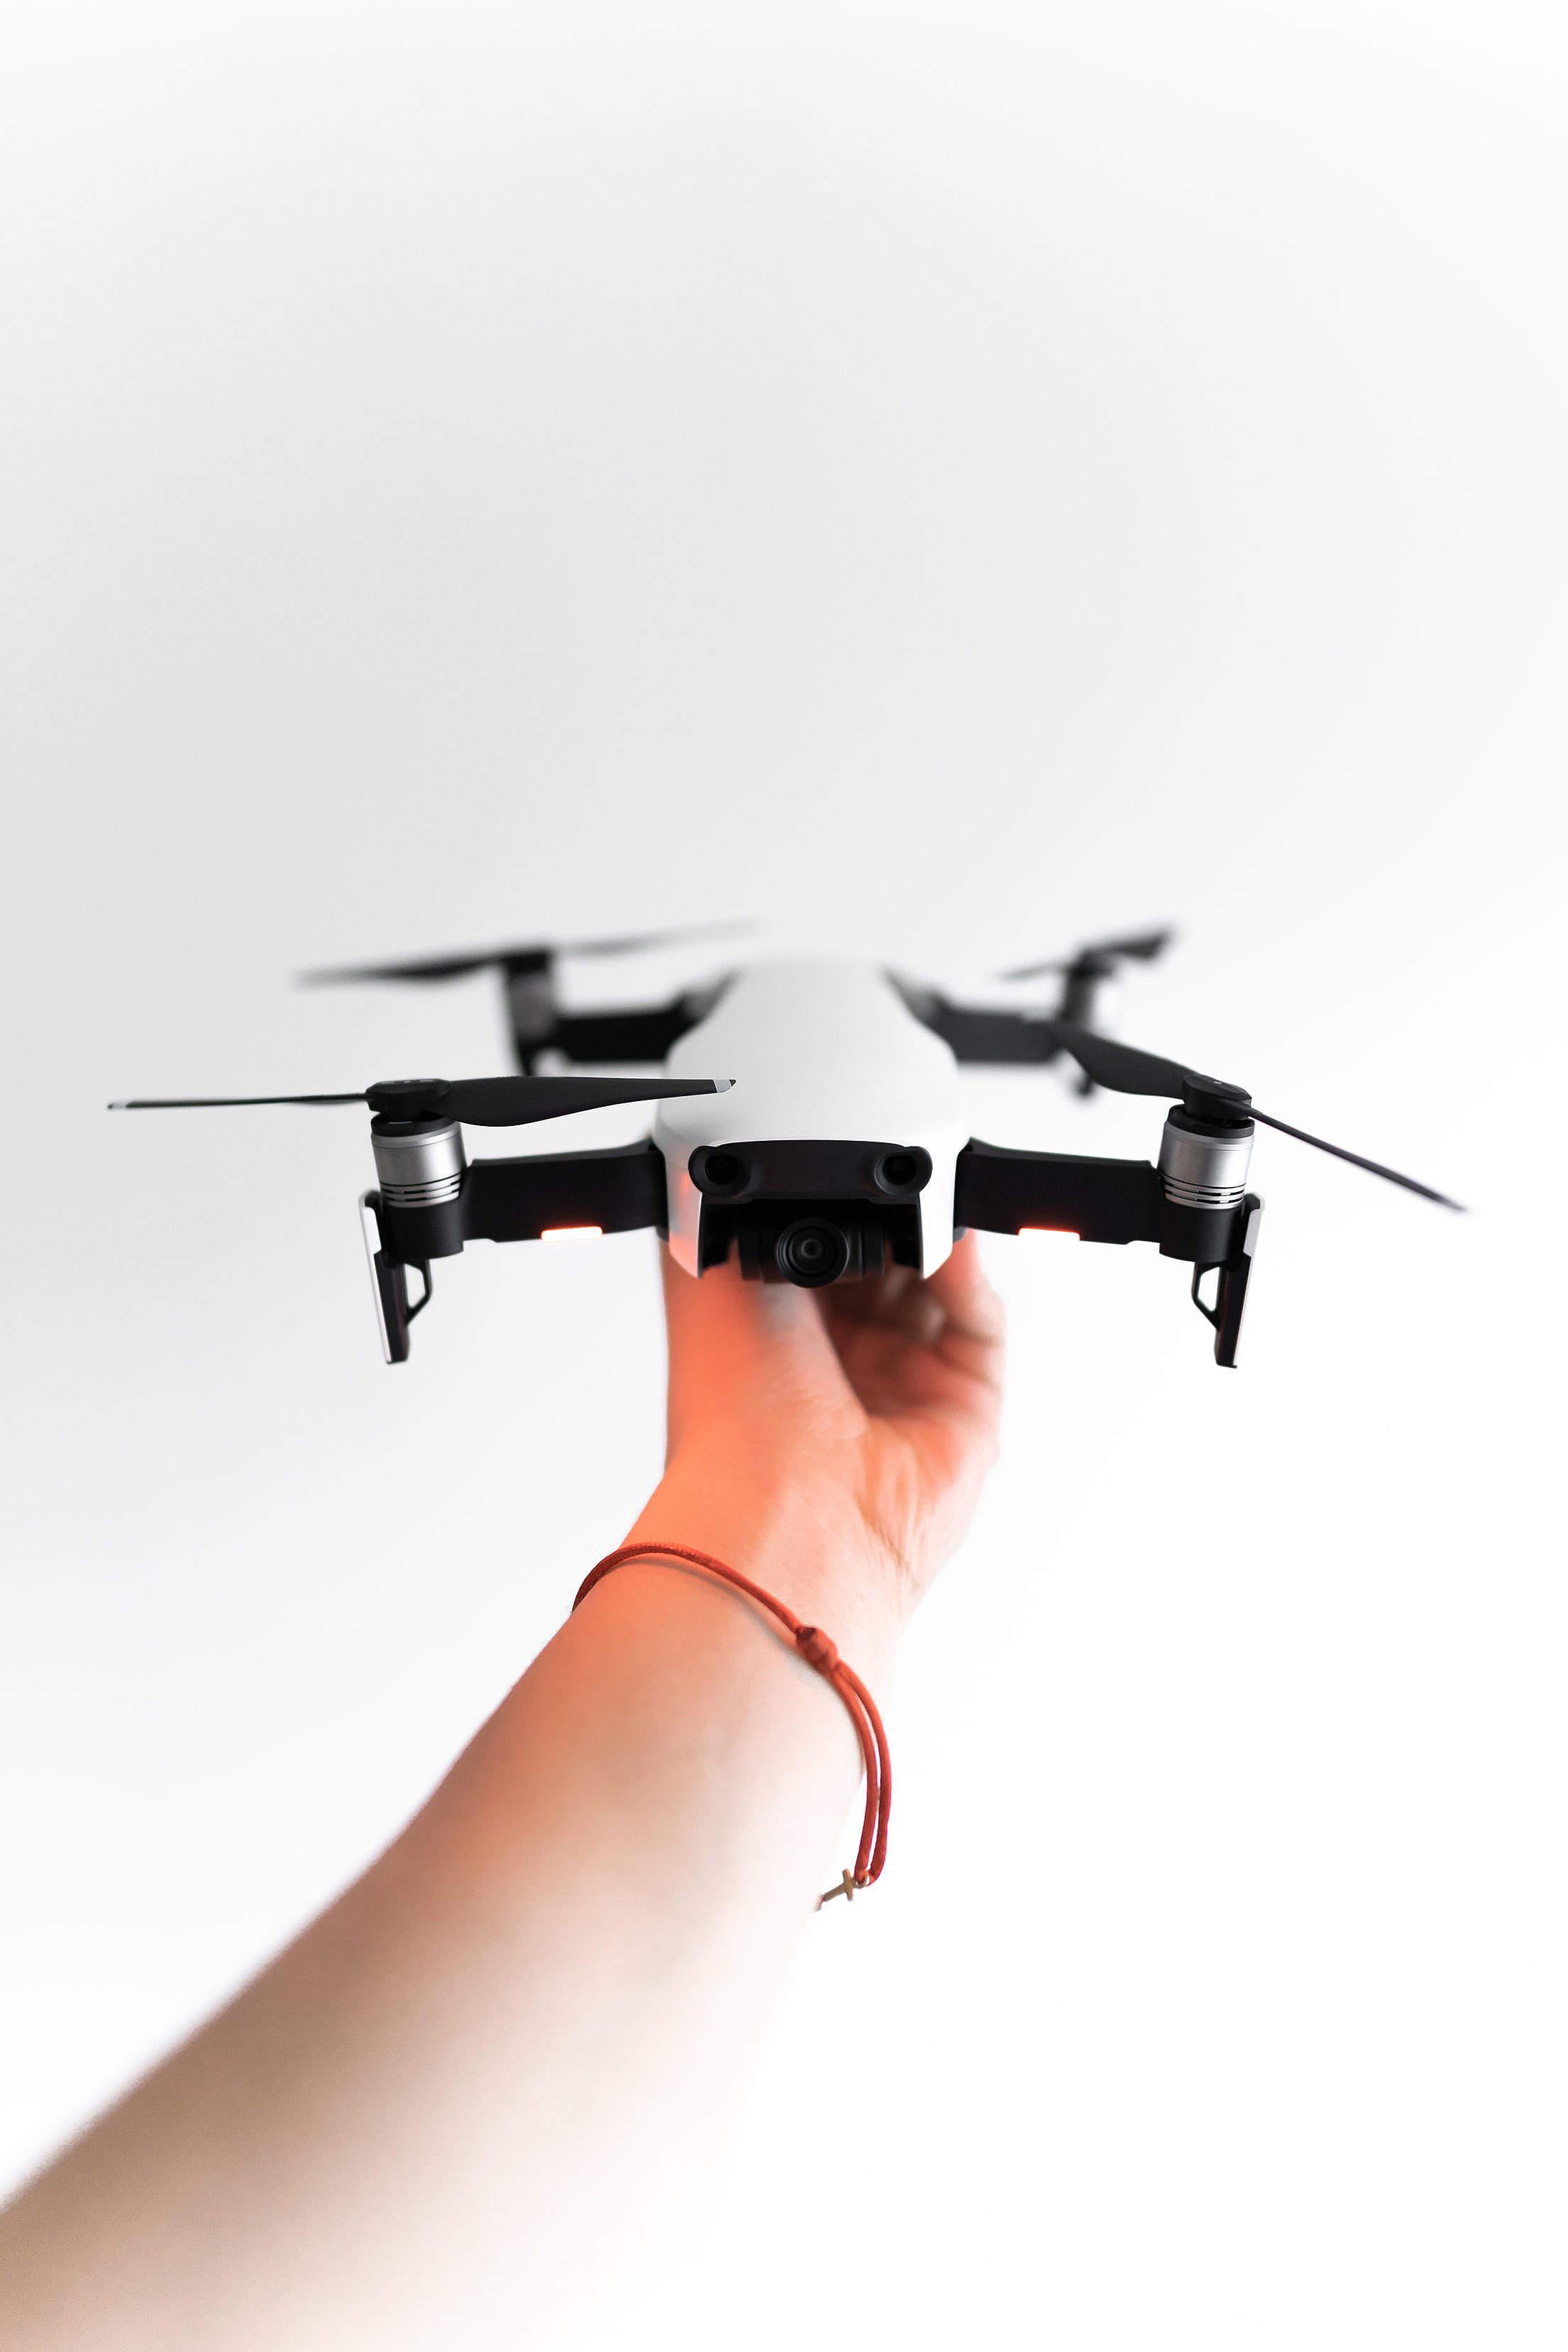 DJI Mavic Air Drone Free Stock Photo